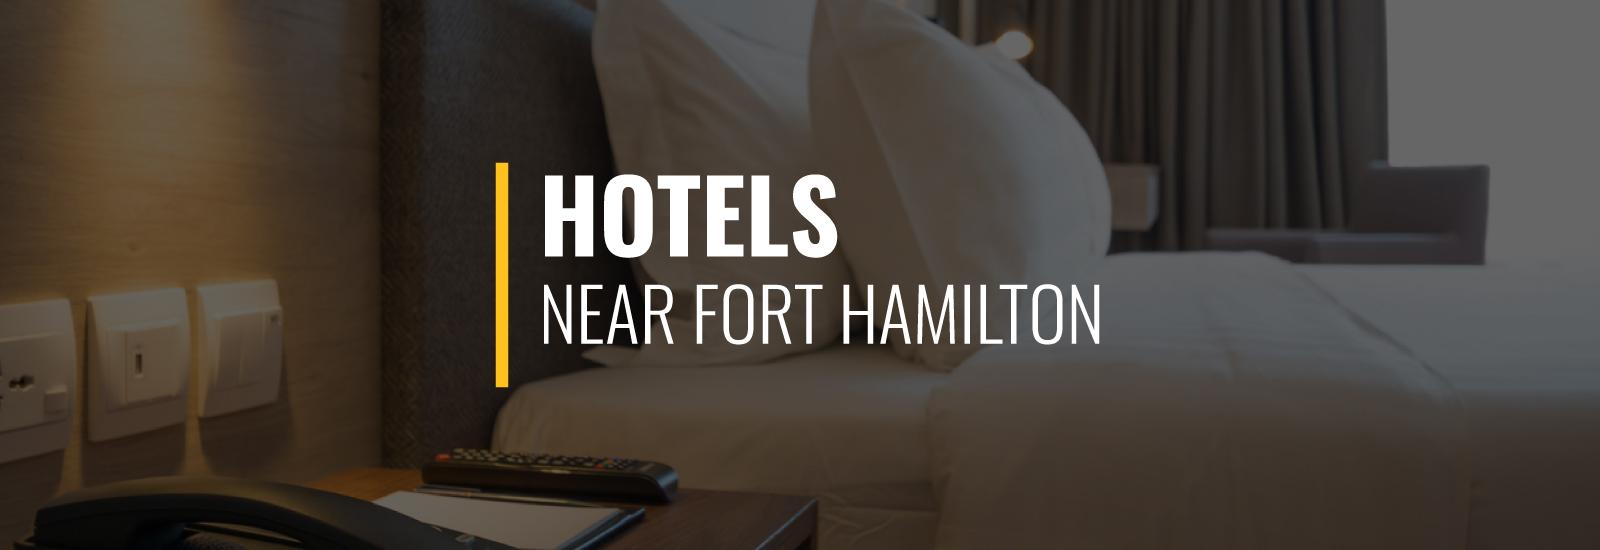 Fort Hamilton Hotels